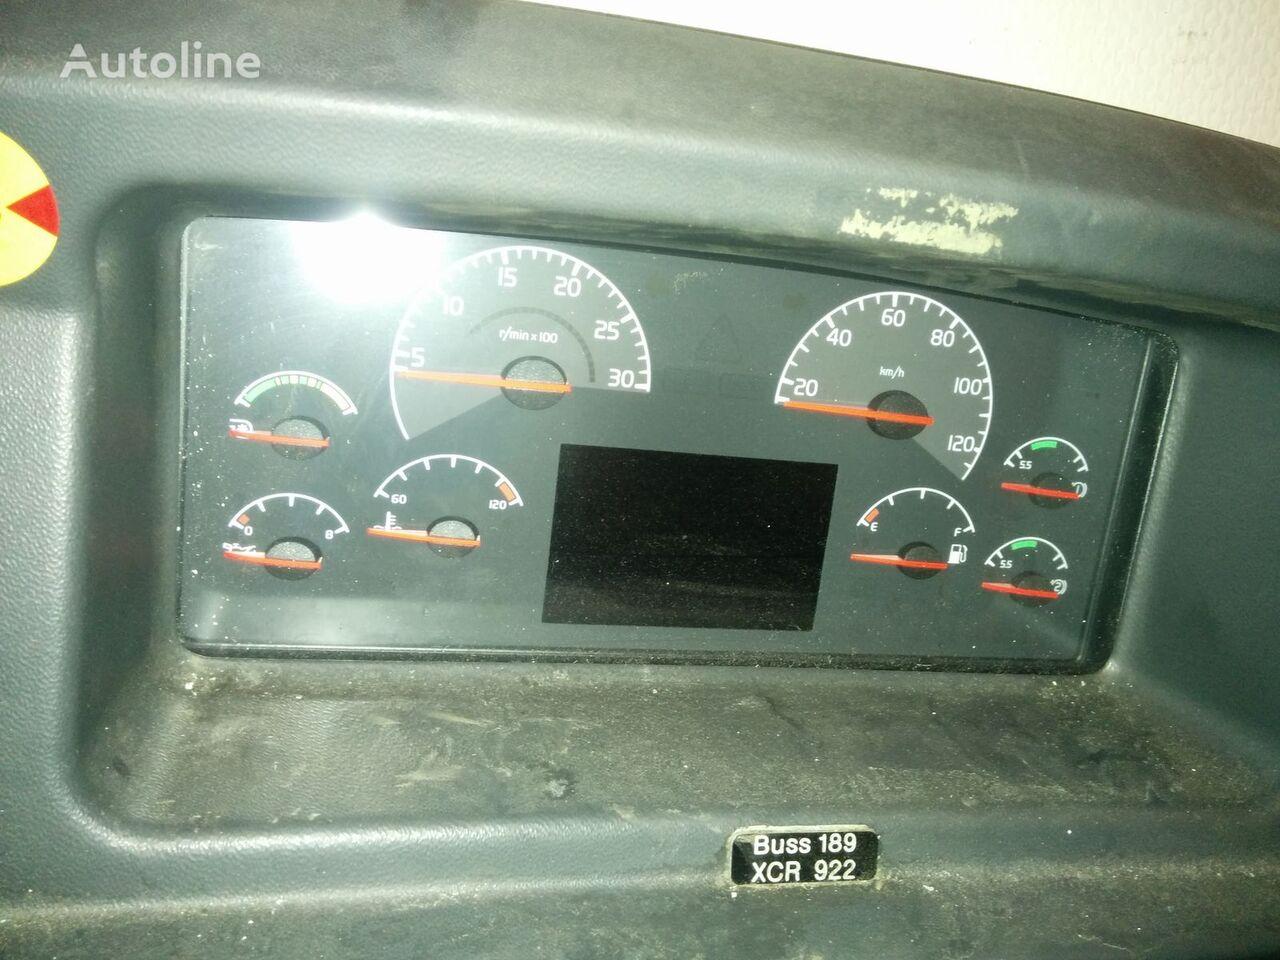 VOLVO klimat kontrol dashboard for VOLVO B12 bus